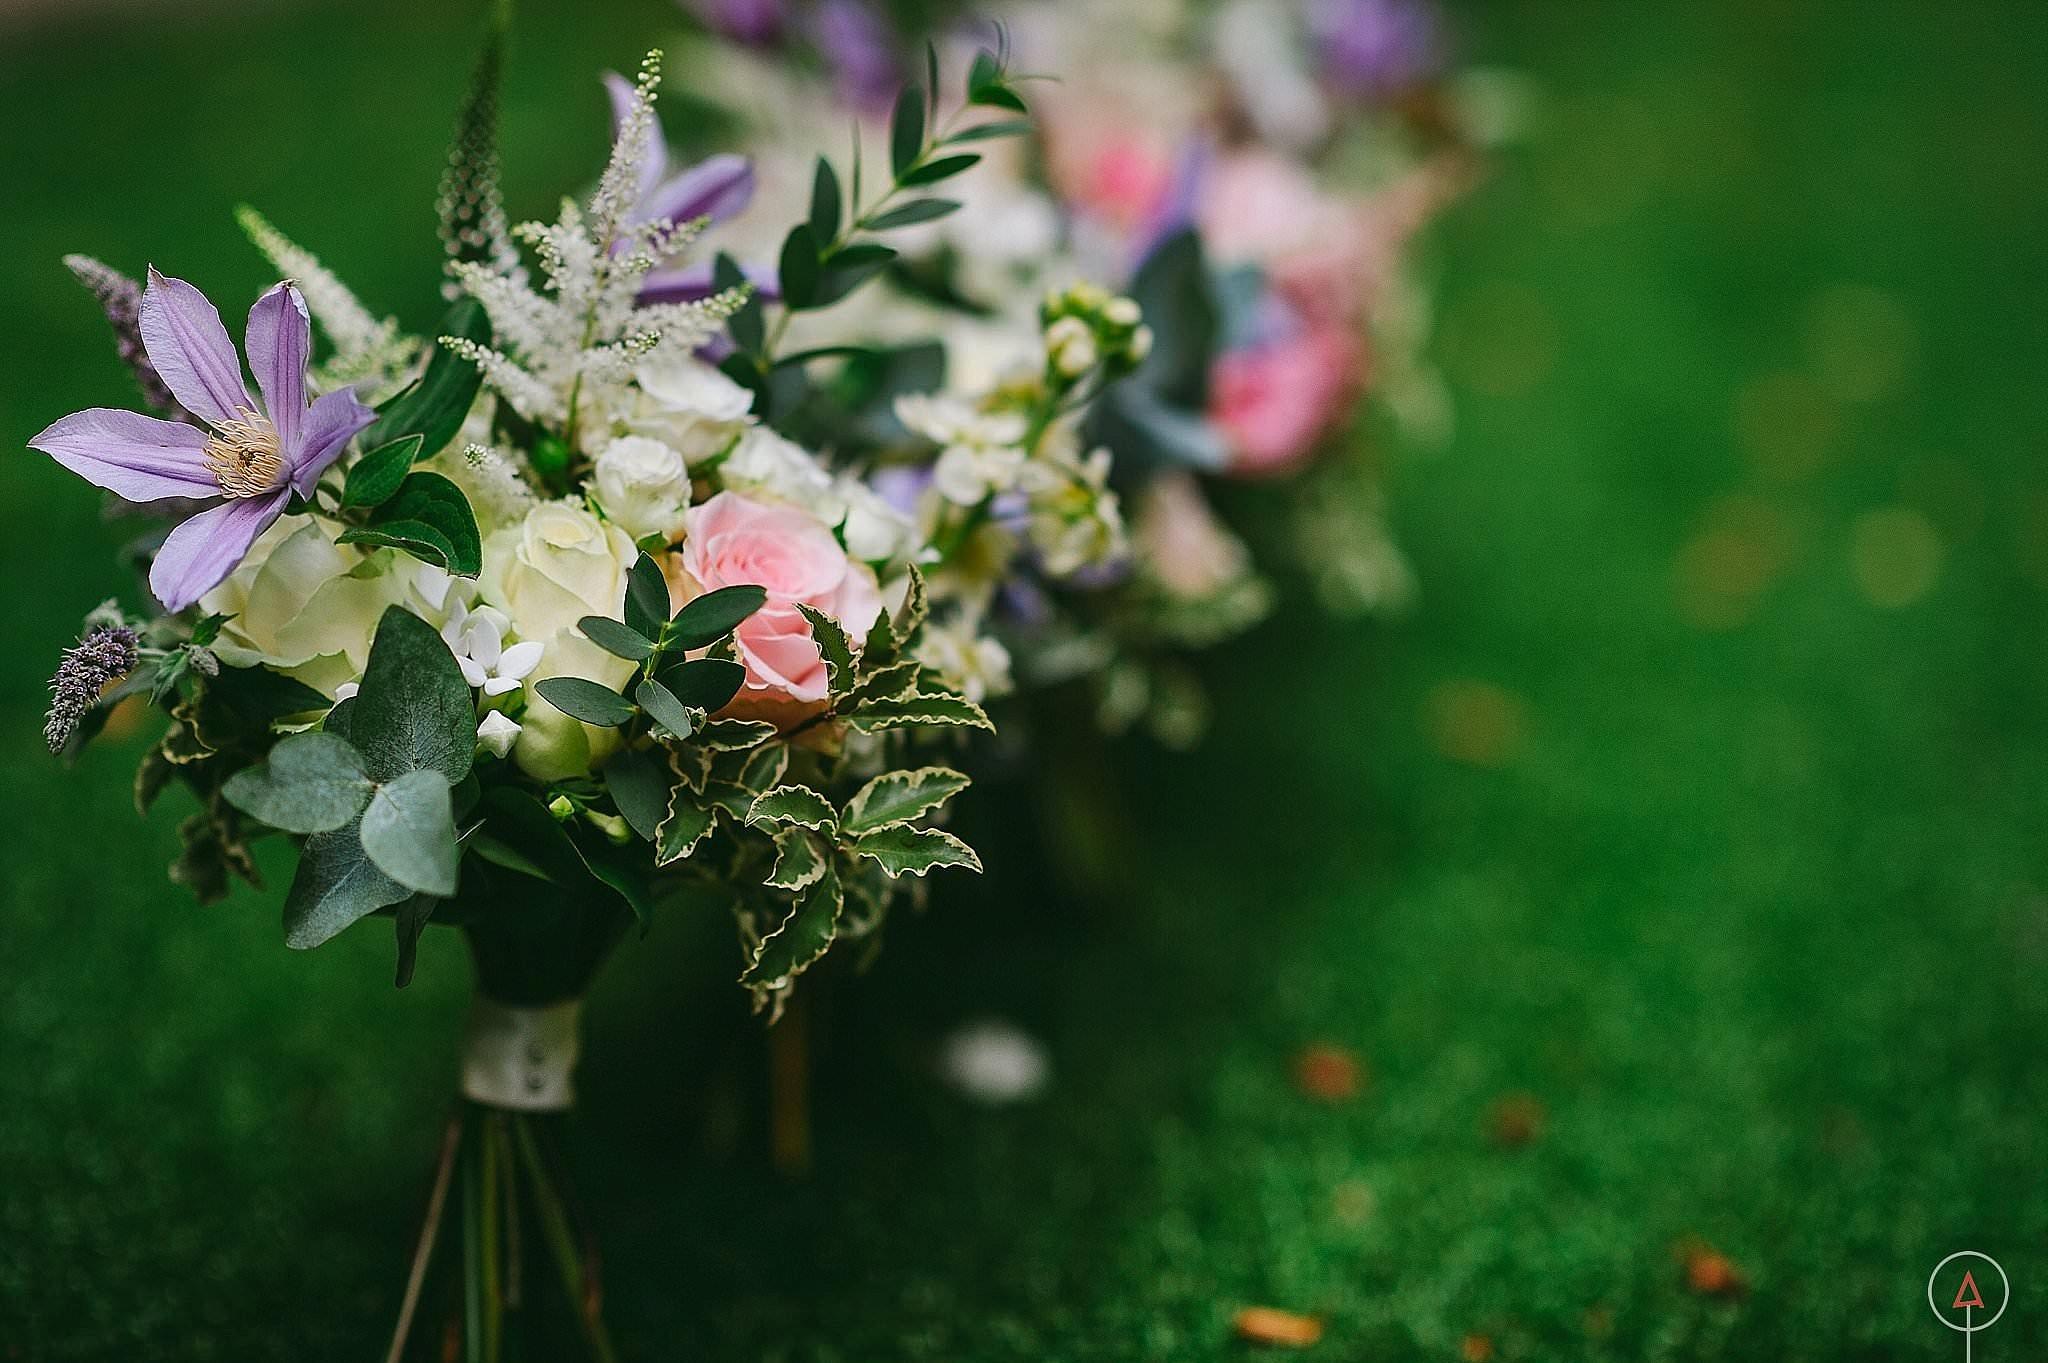 st-donats-llantwit-major-wedding-photography_0137